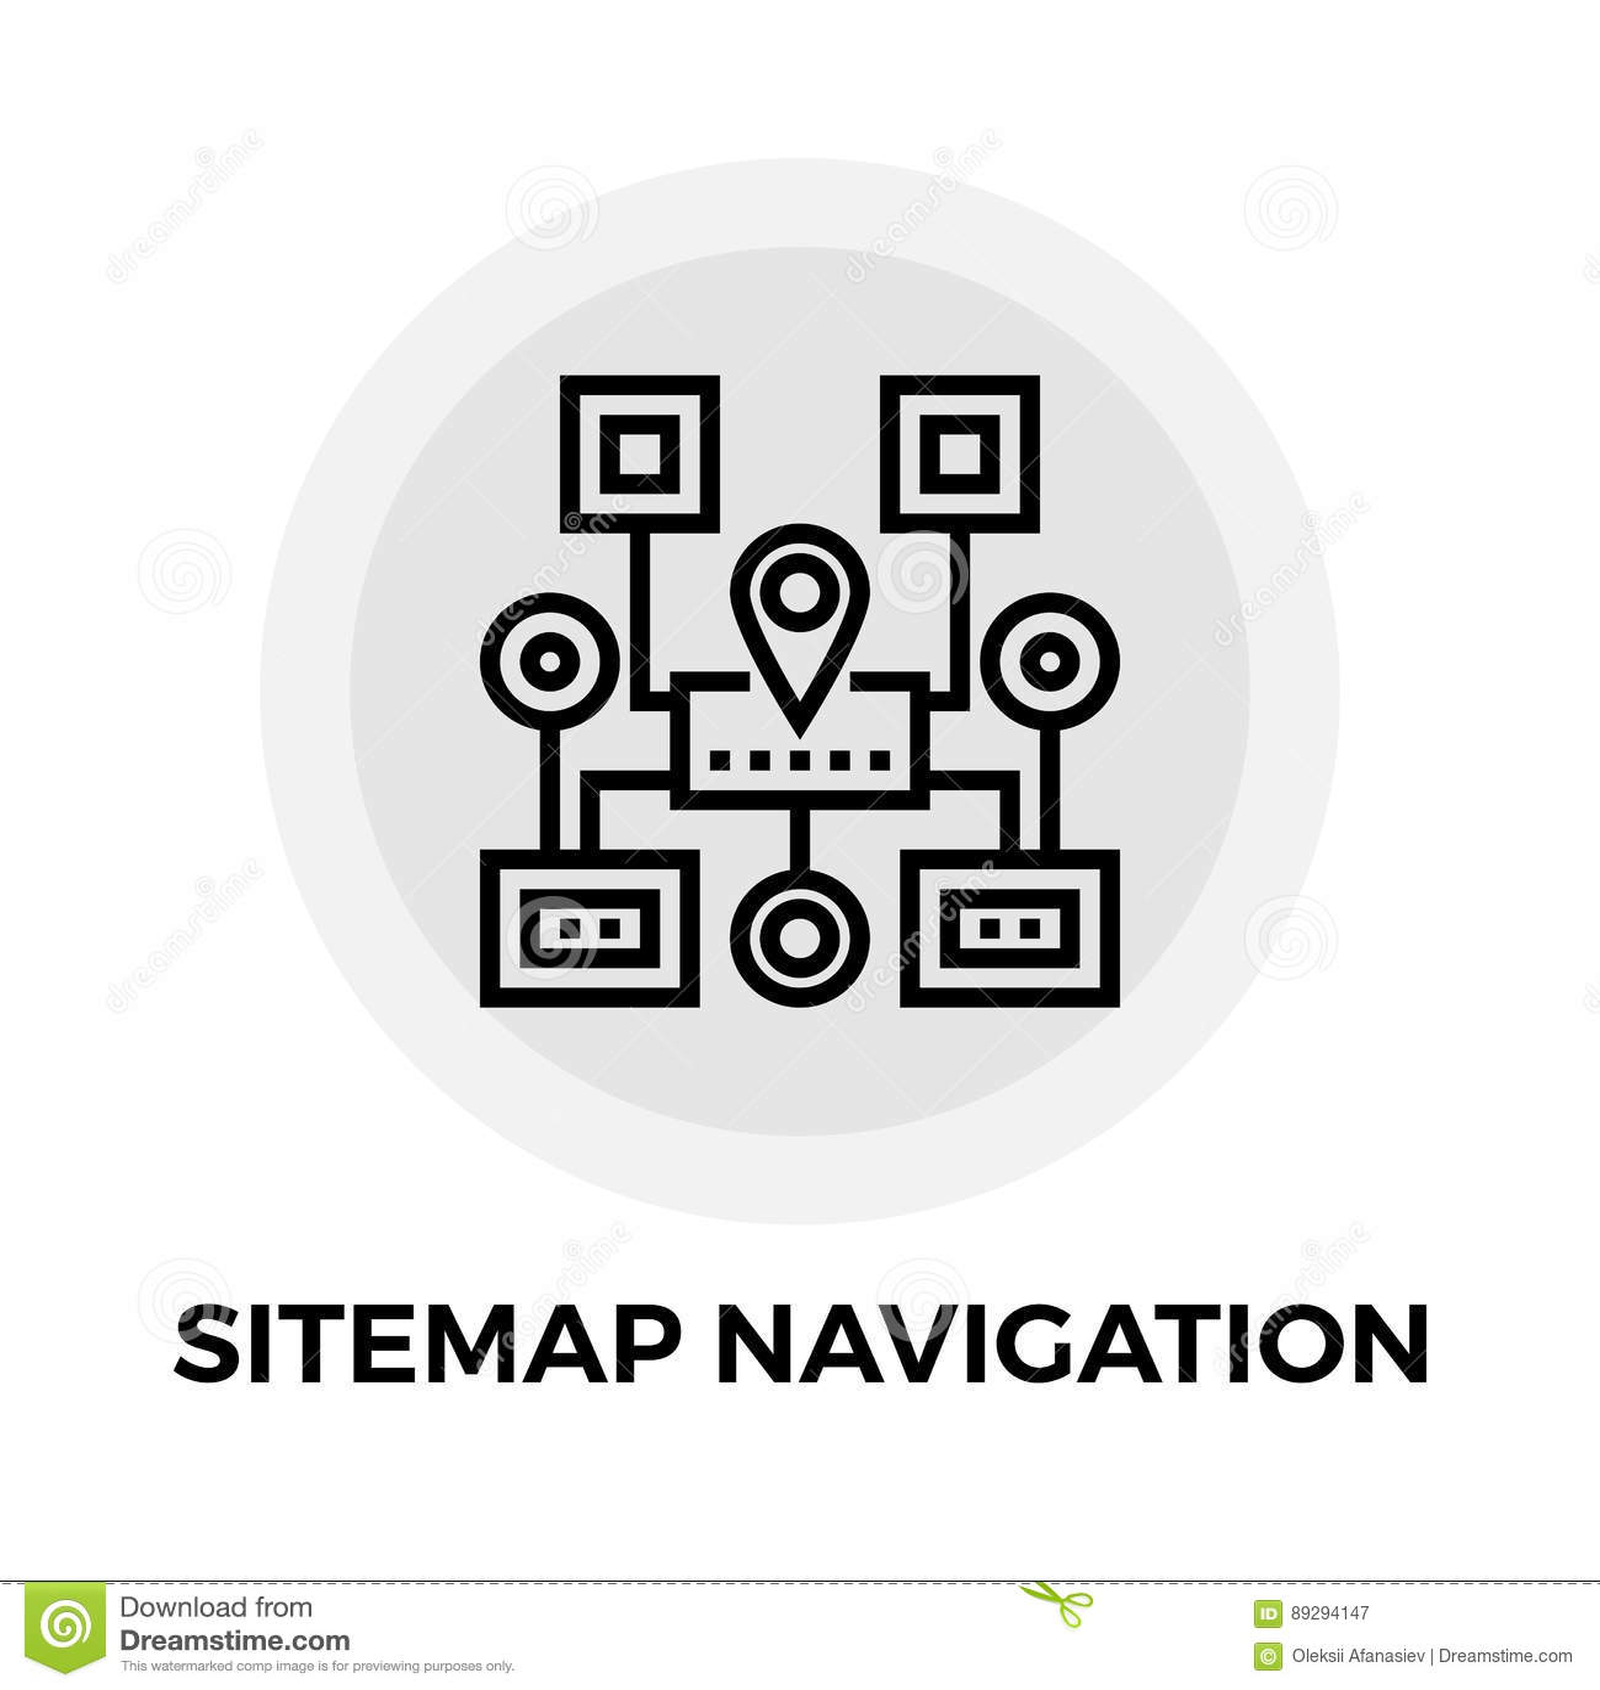 Sitemap Navigation Line Icon